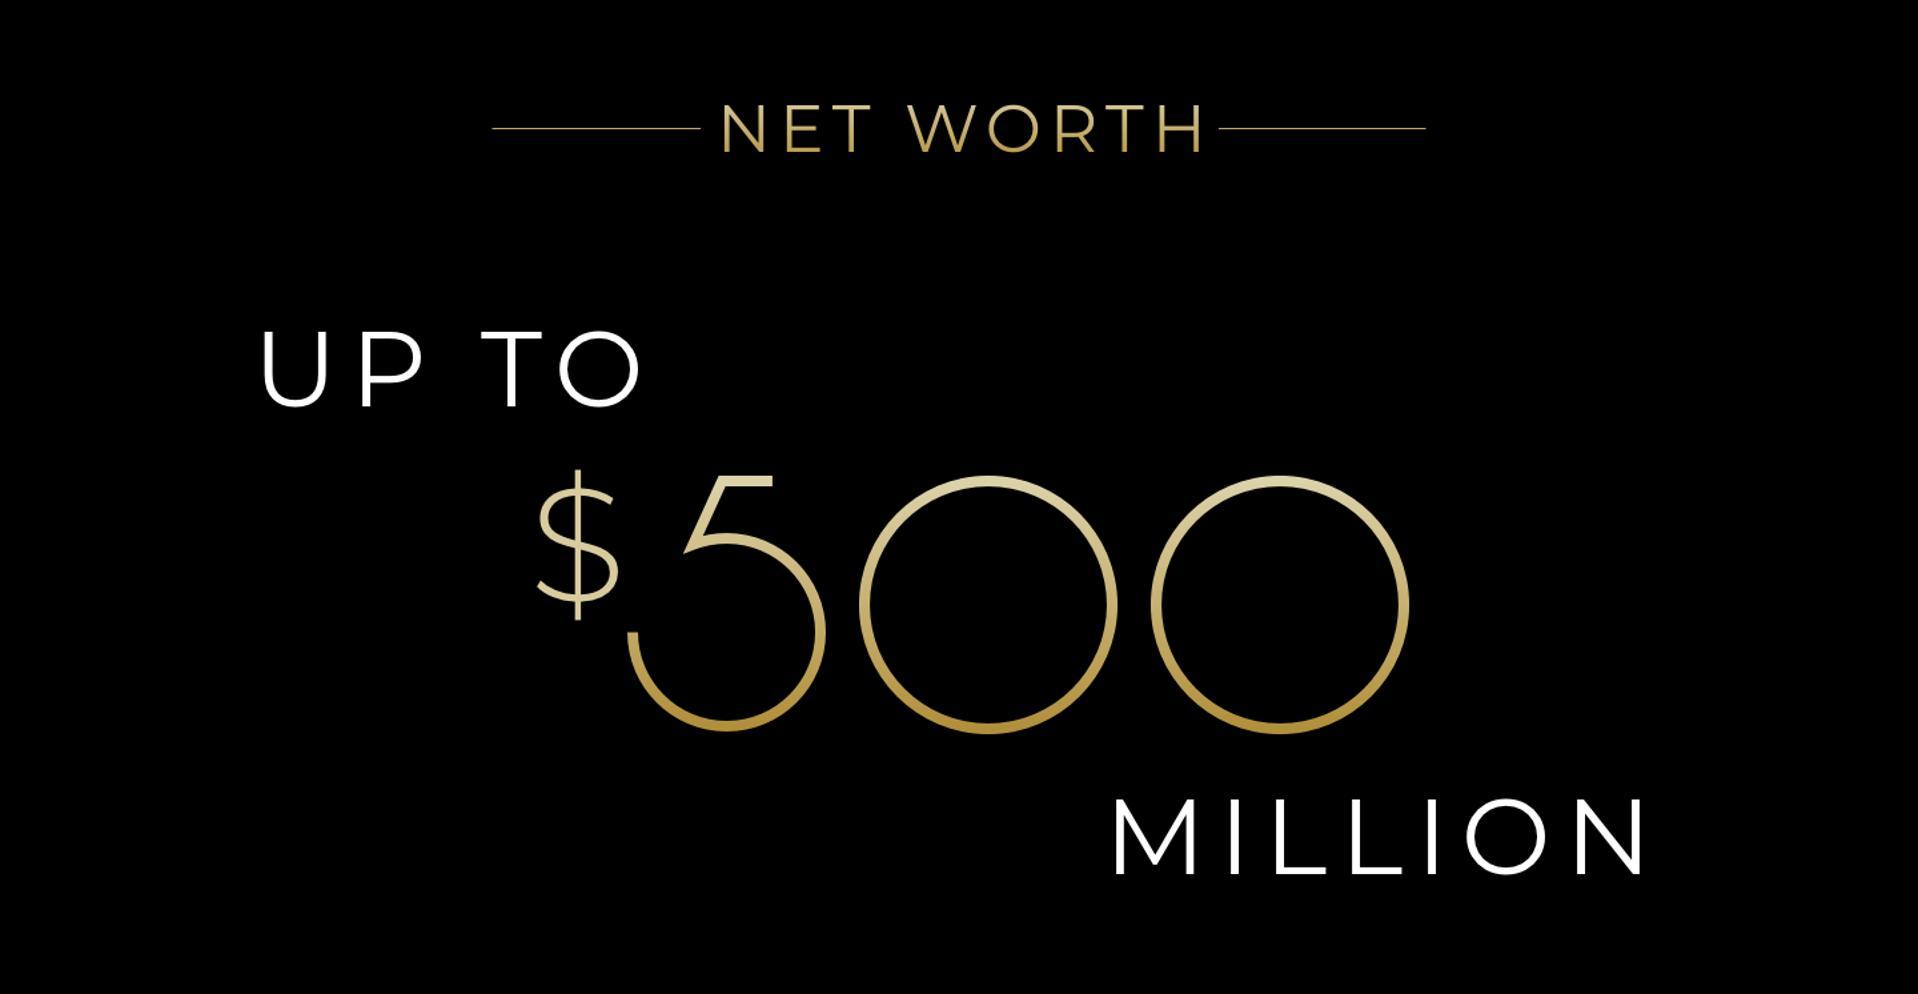 Impact 50: Up To $500 Million